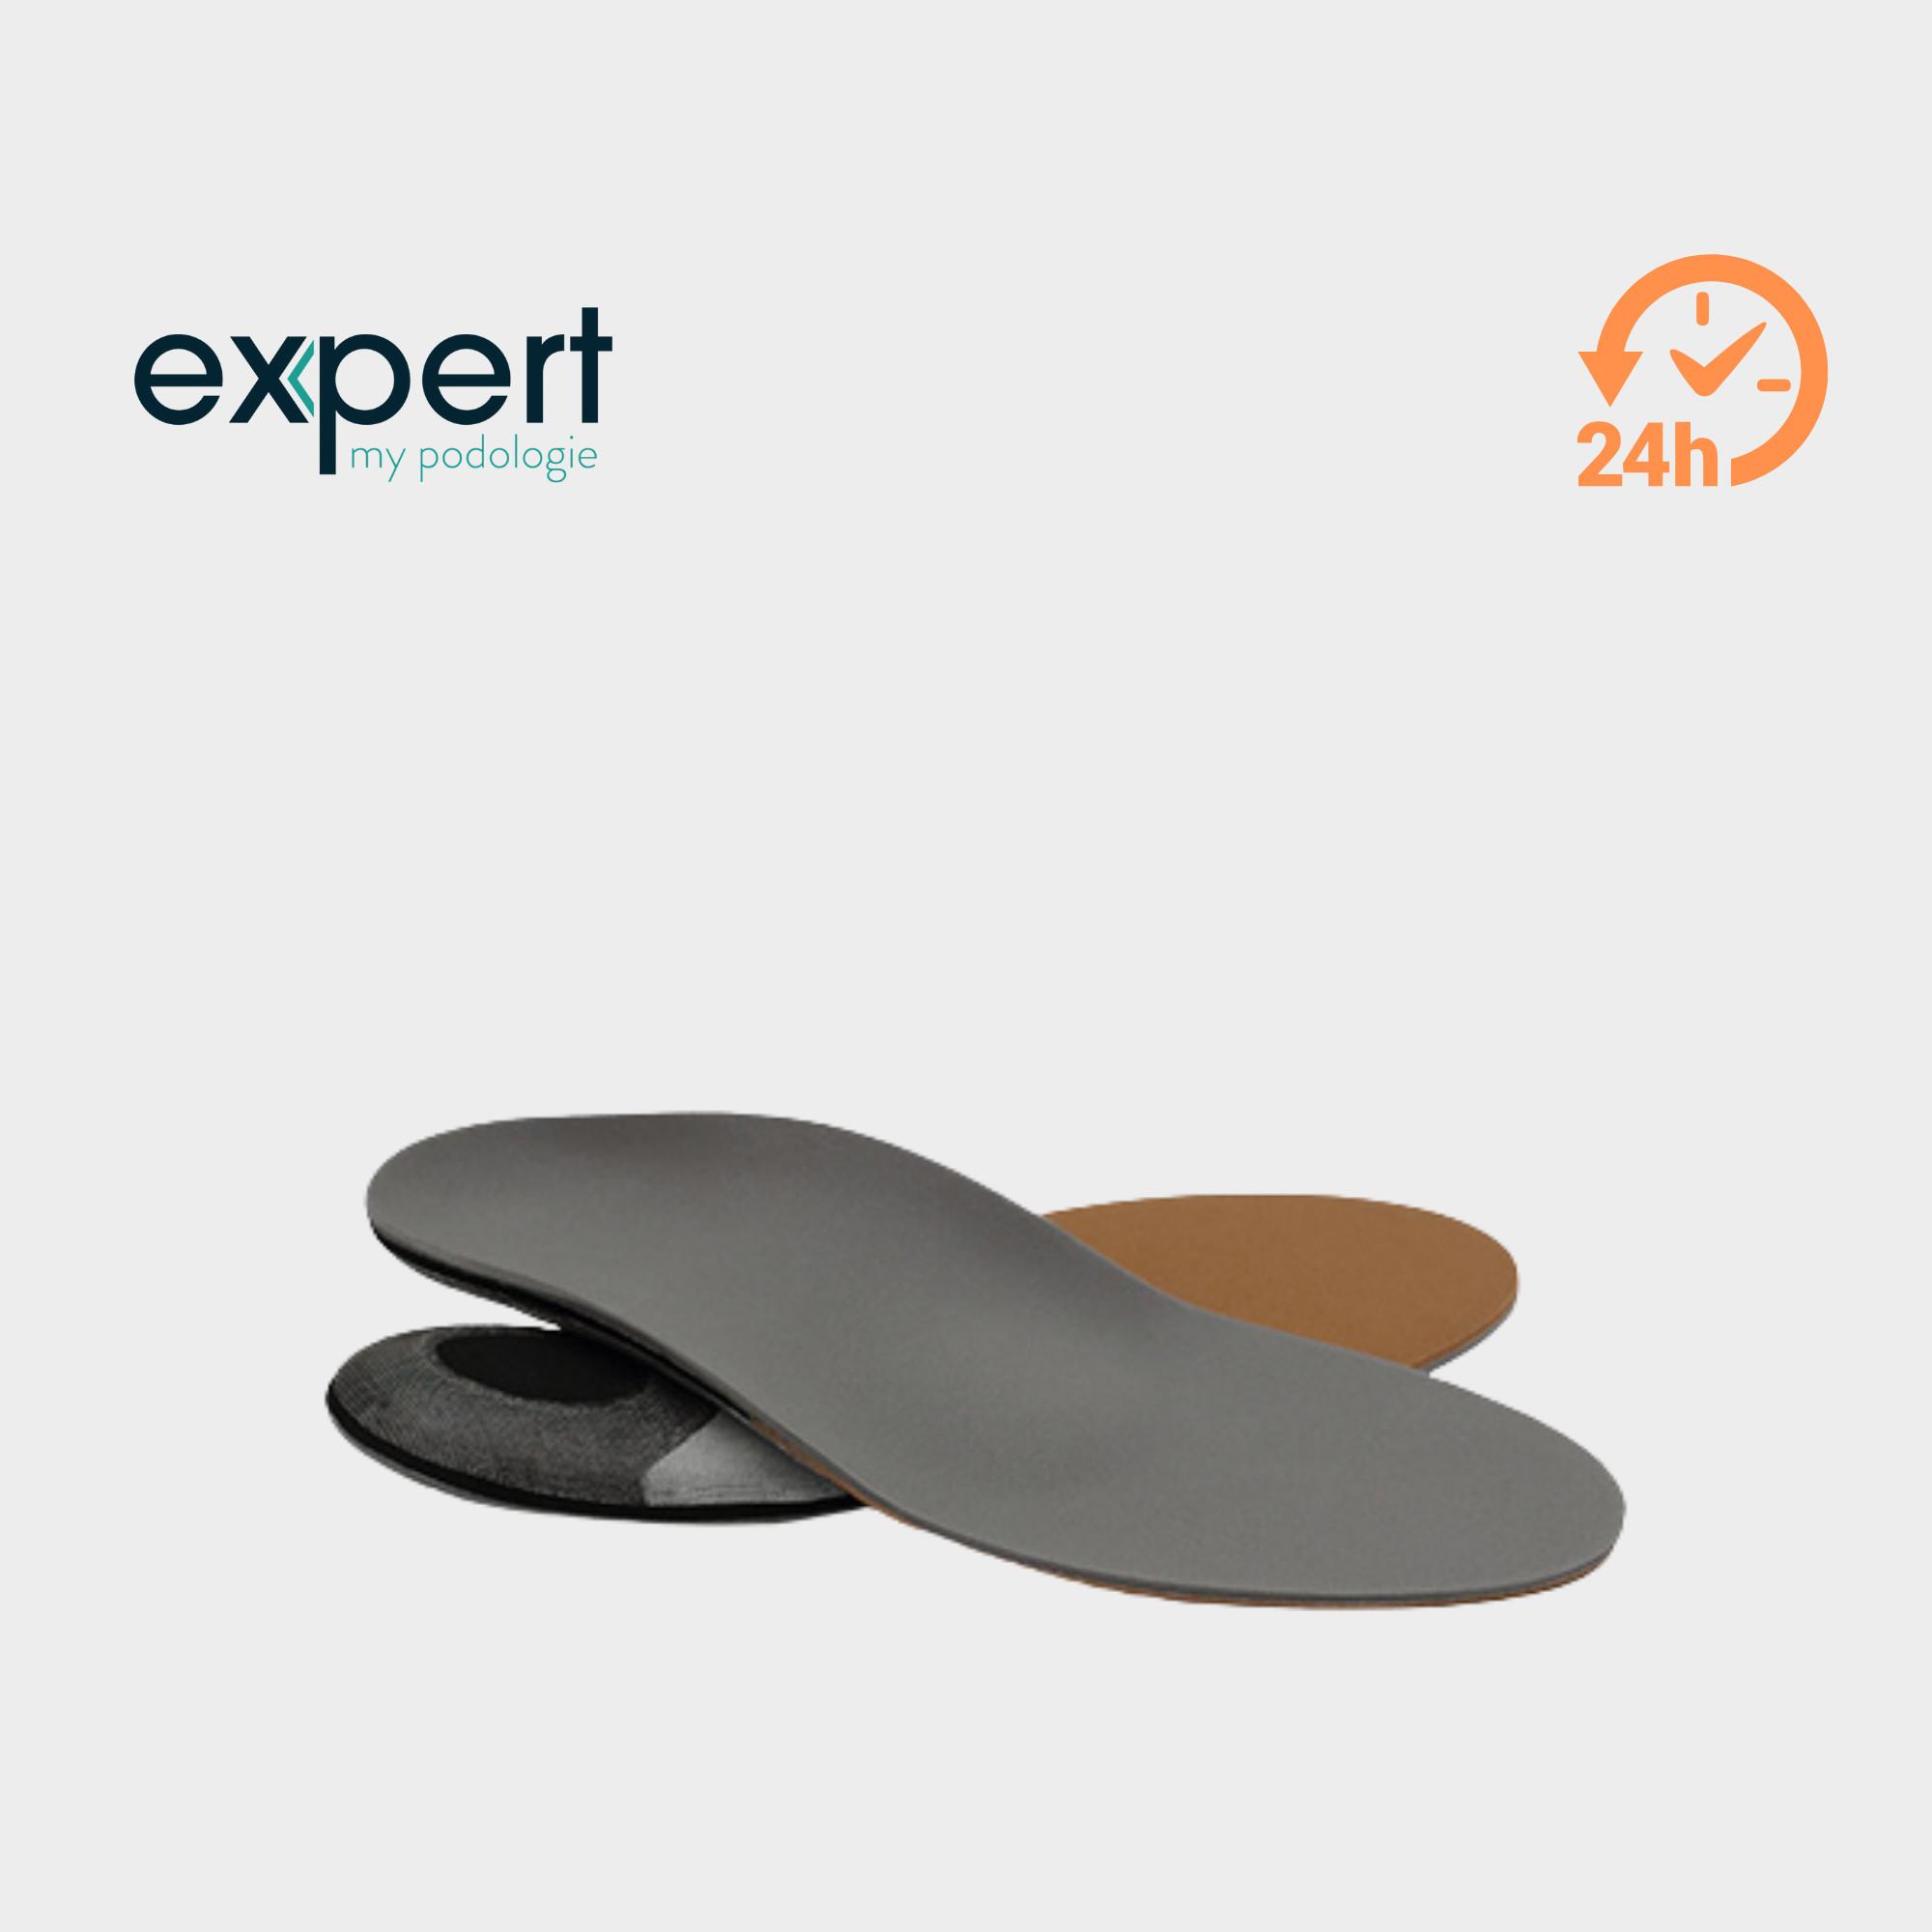 Métatarsalgie Volume Plus - Express 24h - Expert by My Podologie